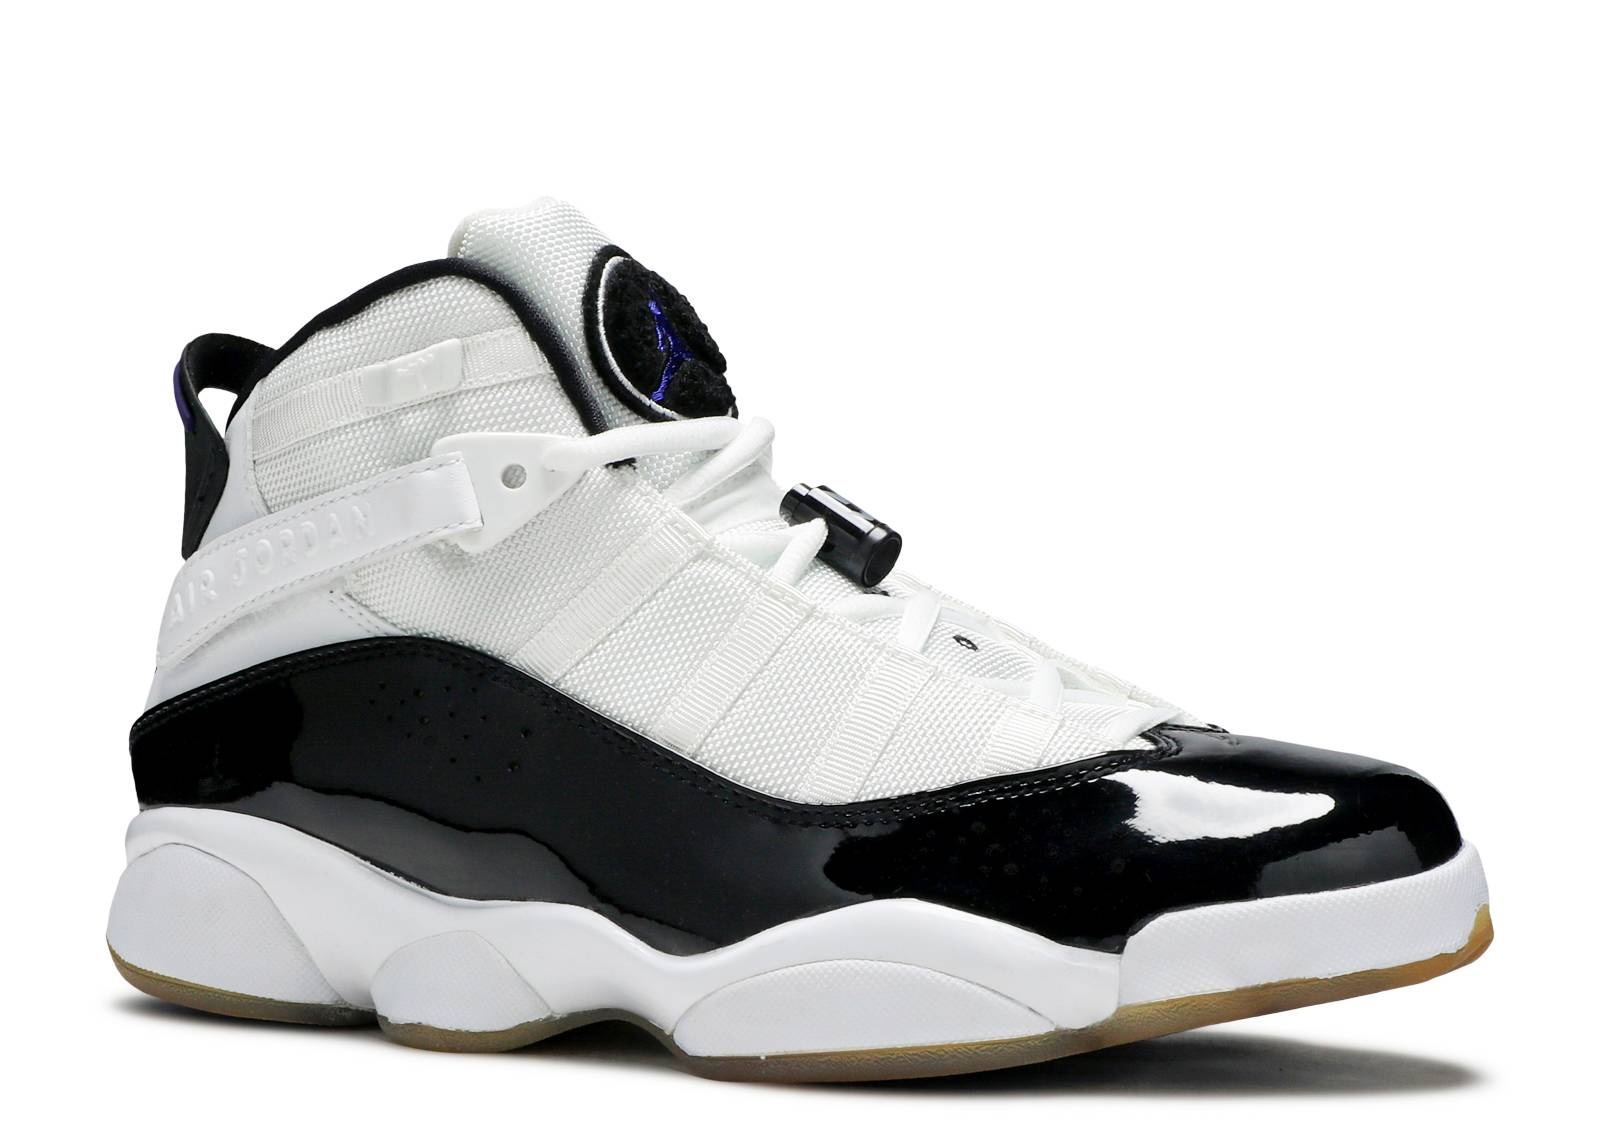 Jordan 6 Rings Quot Concord Quot White Dark Concord Black